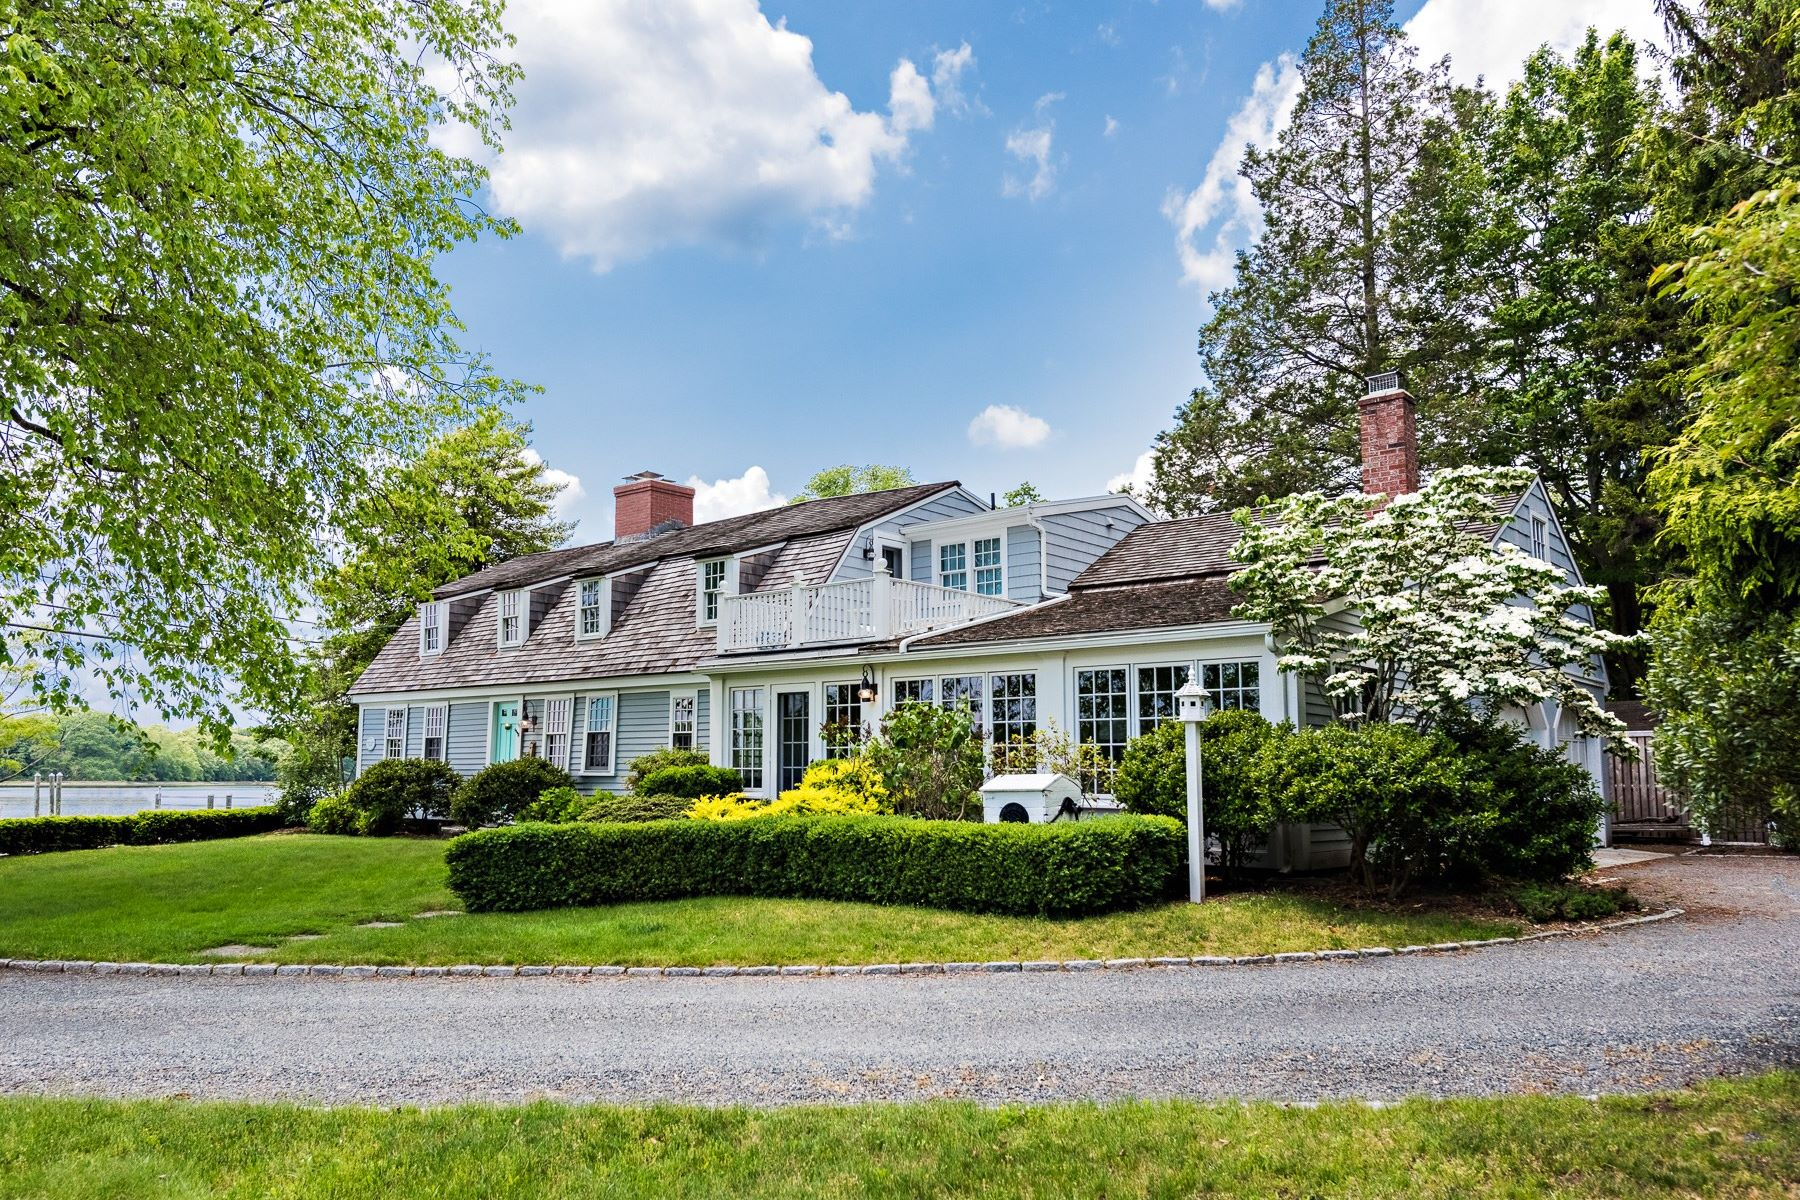 Single Family Homes for Sale at 125 New Meadow Road, Barrington, RI Barrington, Rhode Island 02806 United States